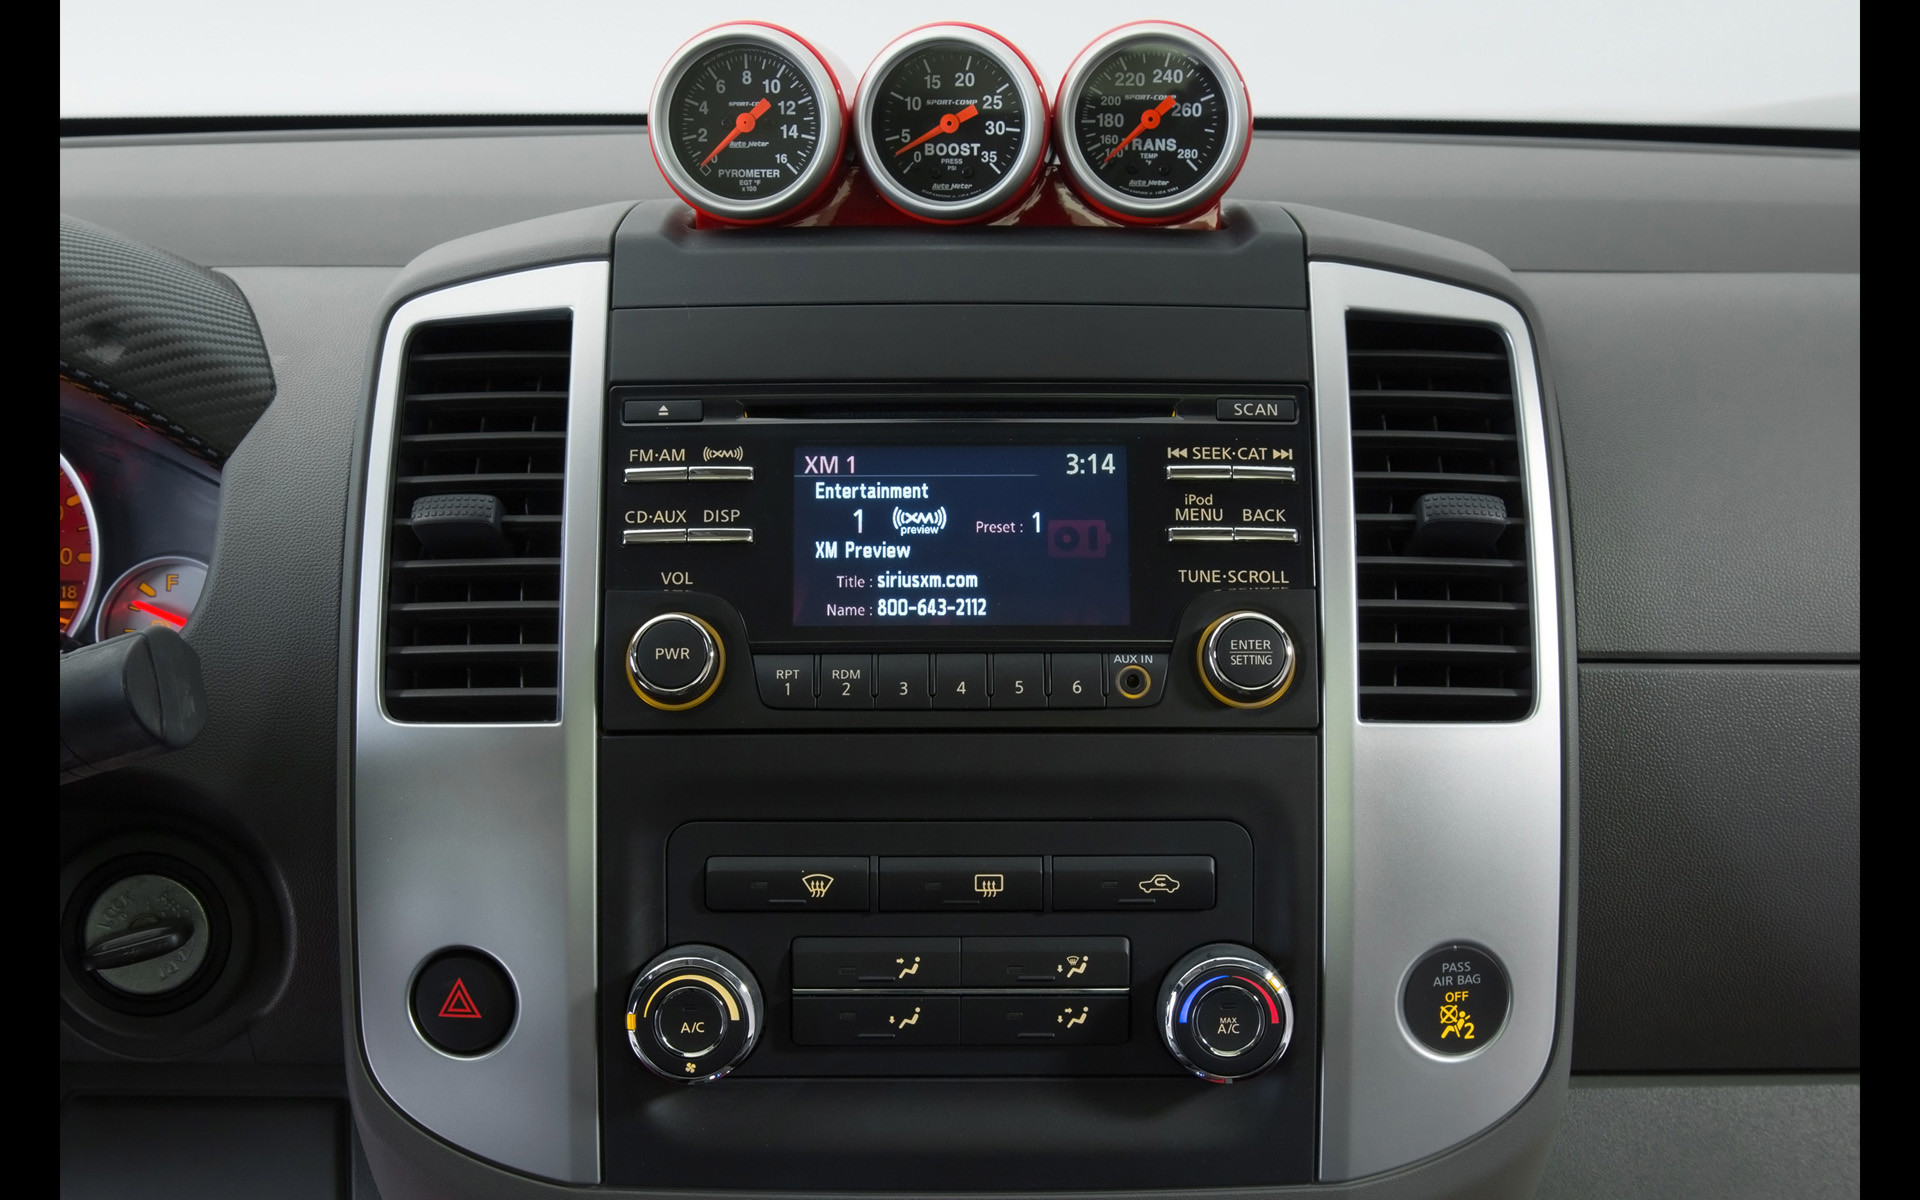 2014 Nissan Frontier Diesel Runner Powered by Cummins – Interior – 5 –  – Wallpaper